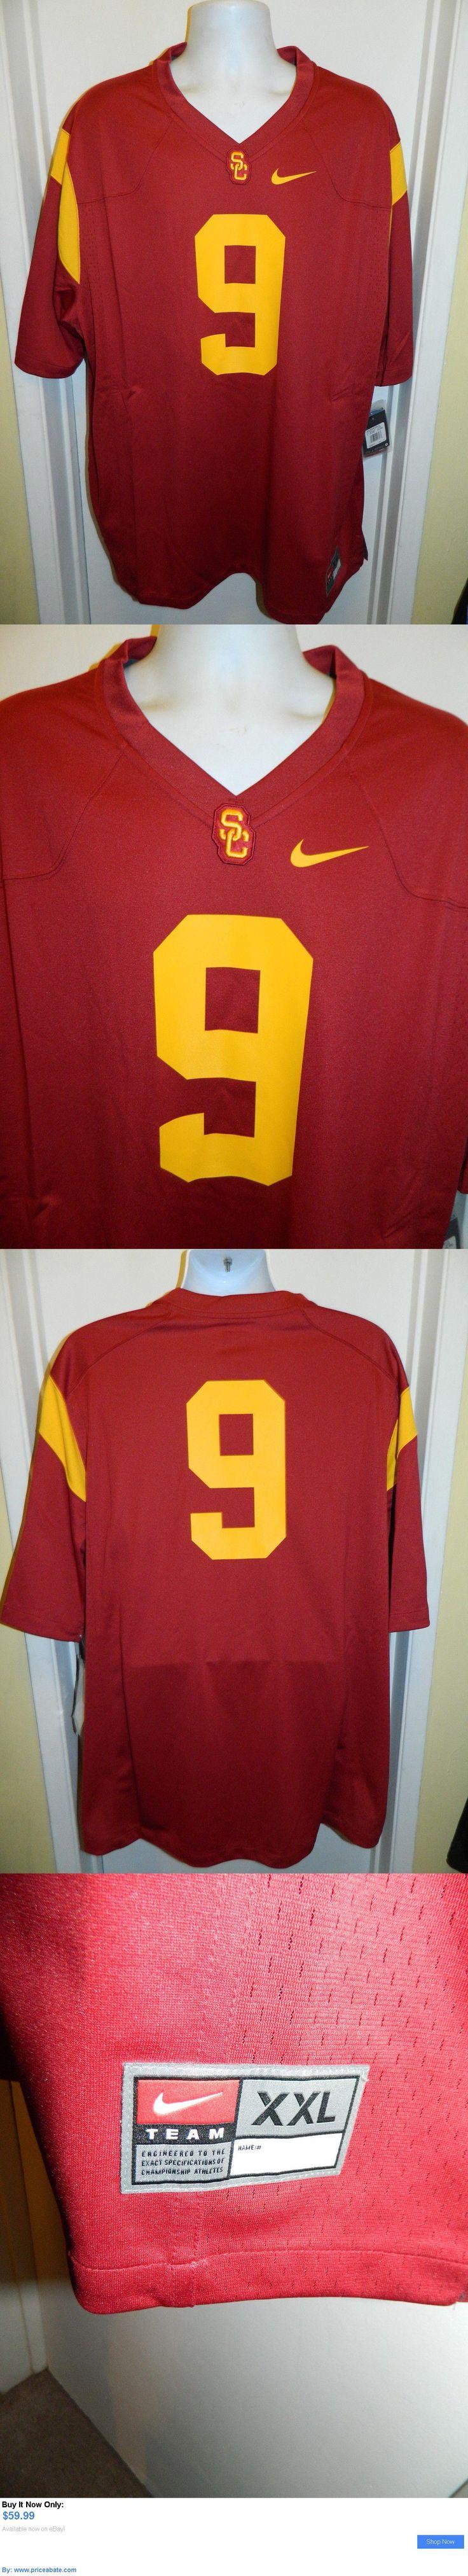 Sports Memorabilia: Usc Trojans New Nike College Ncaa Football Jersey #9 Mens 2Xl BUY IT NOW ONLY: $59.99 #priceabateSportsMemorabilia OR #priceabate